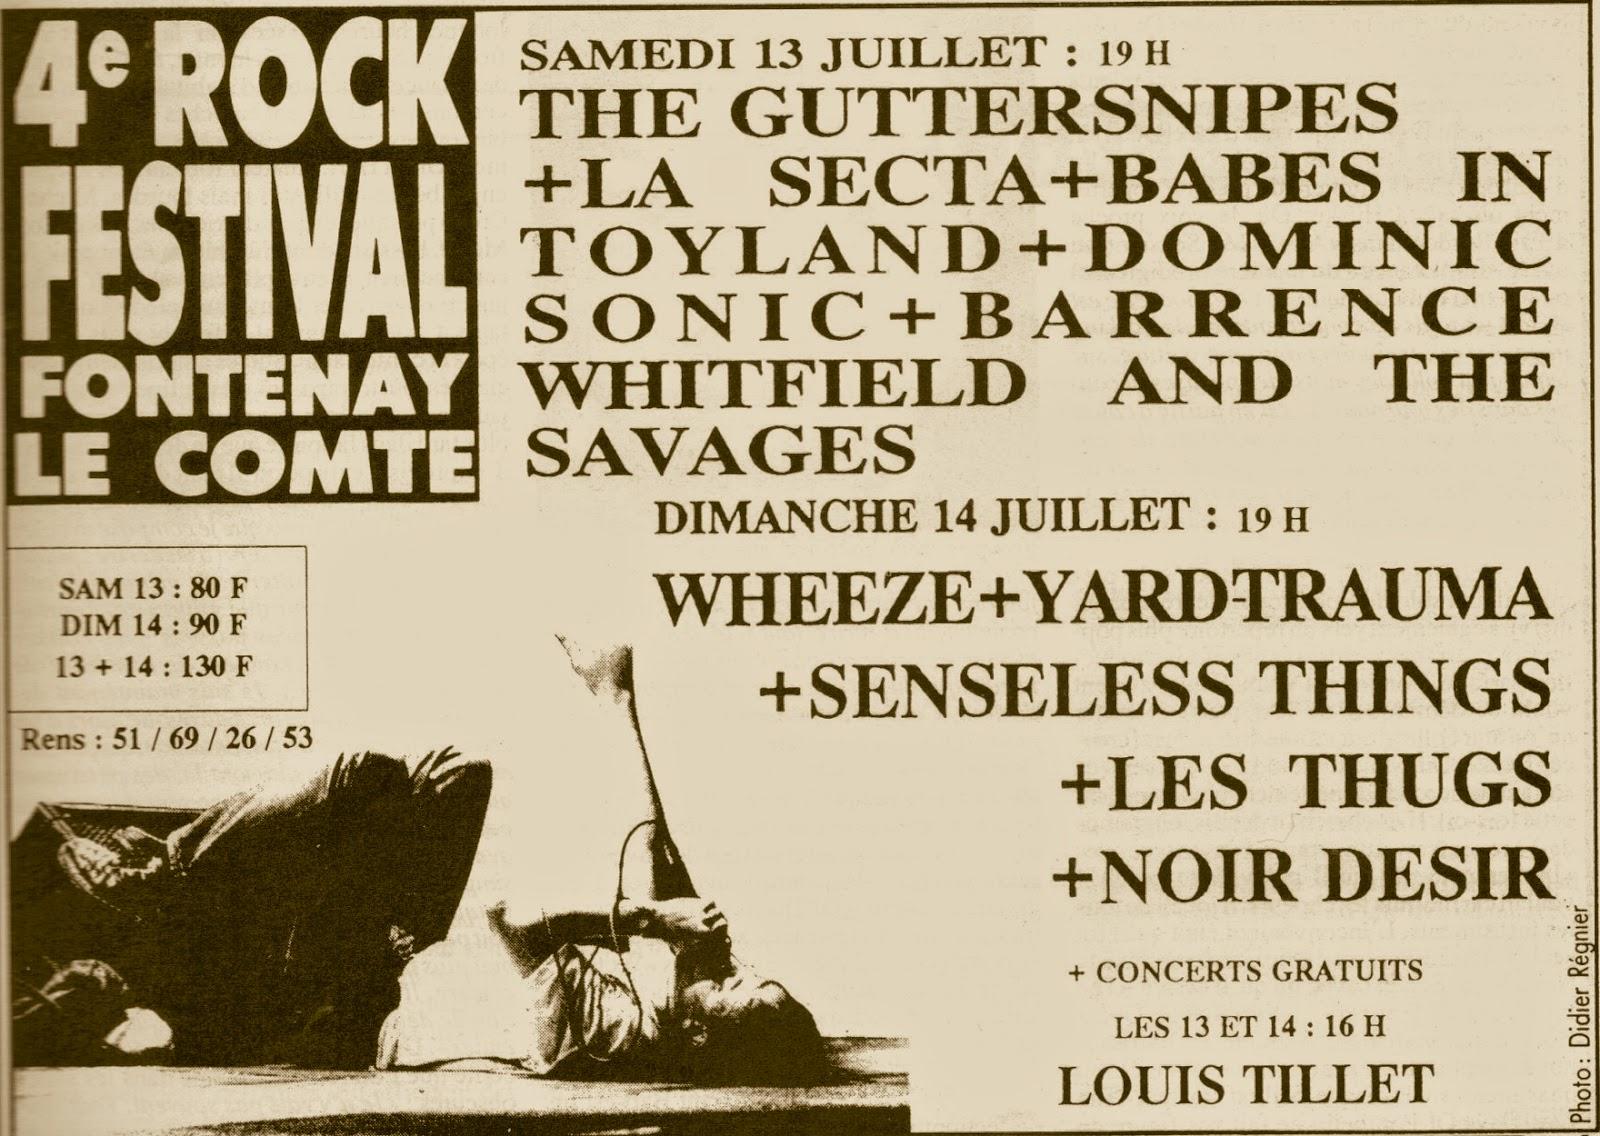 14 juillet 1991 Wheeze, Yard Trauma, Senseless Things, Les Thugs, Noir Desir à Fontenay le Comte